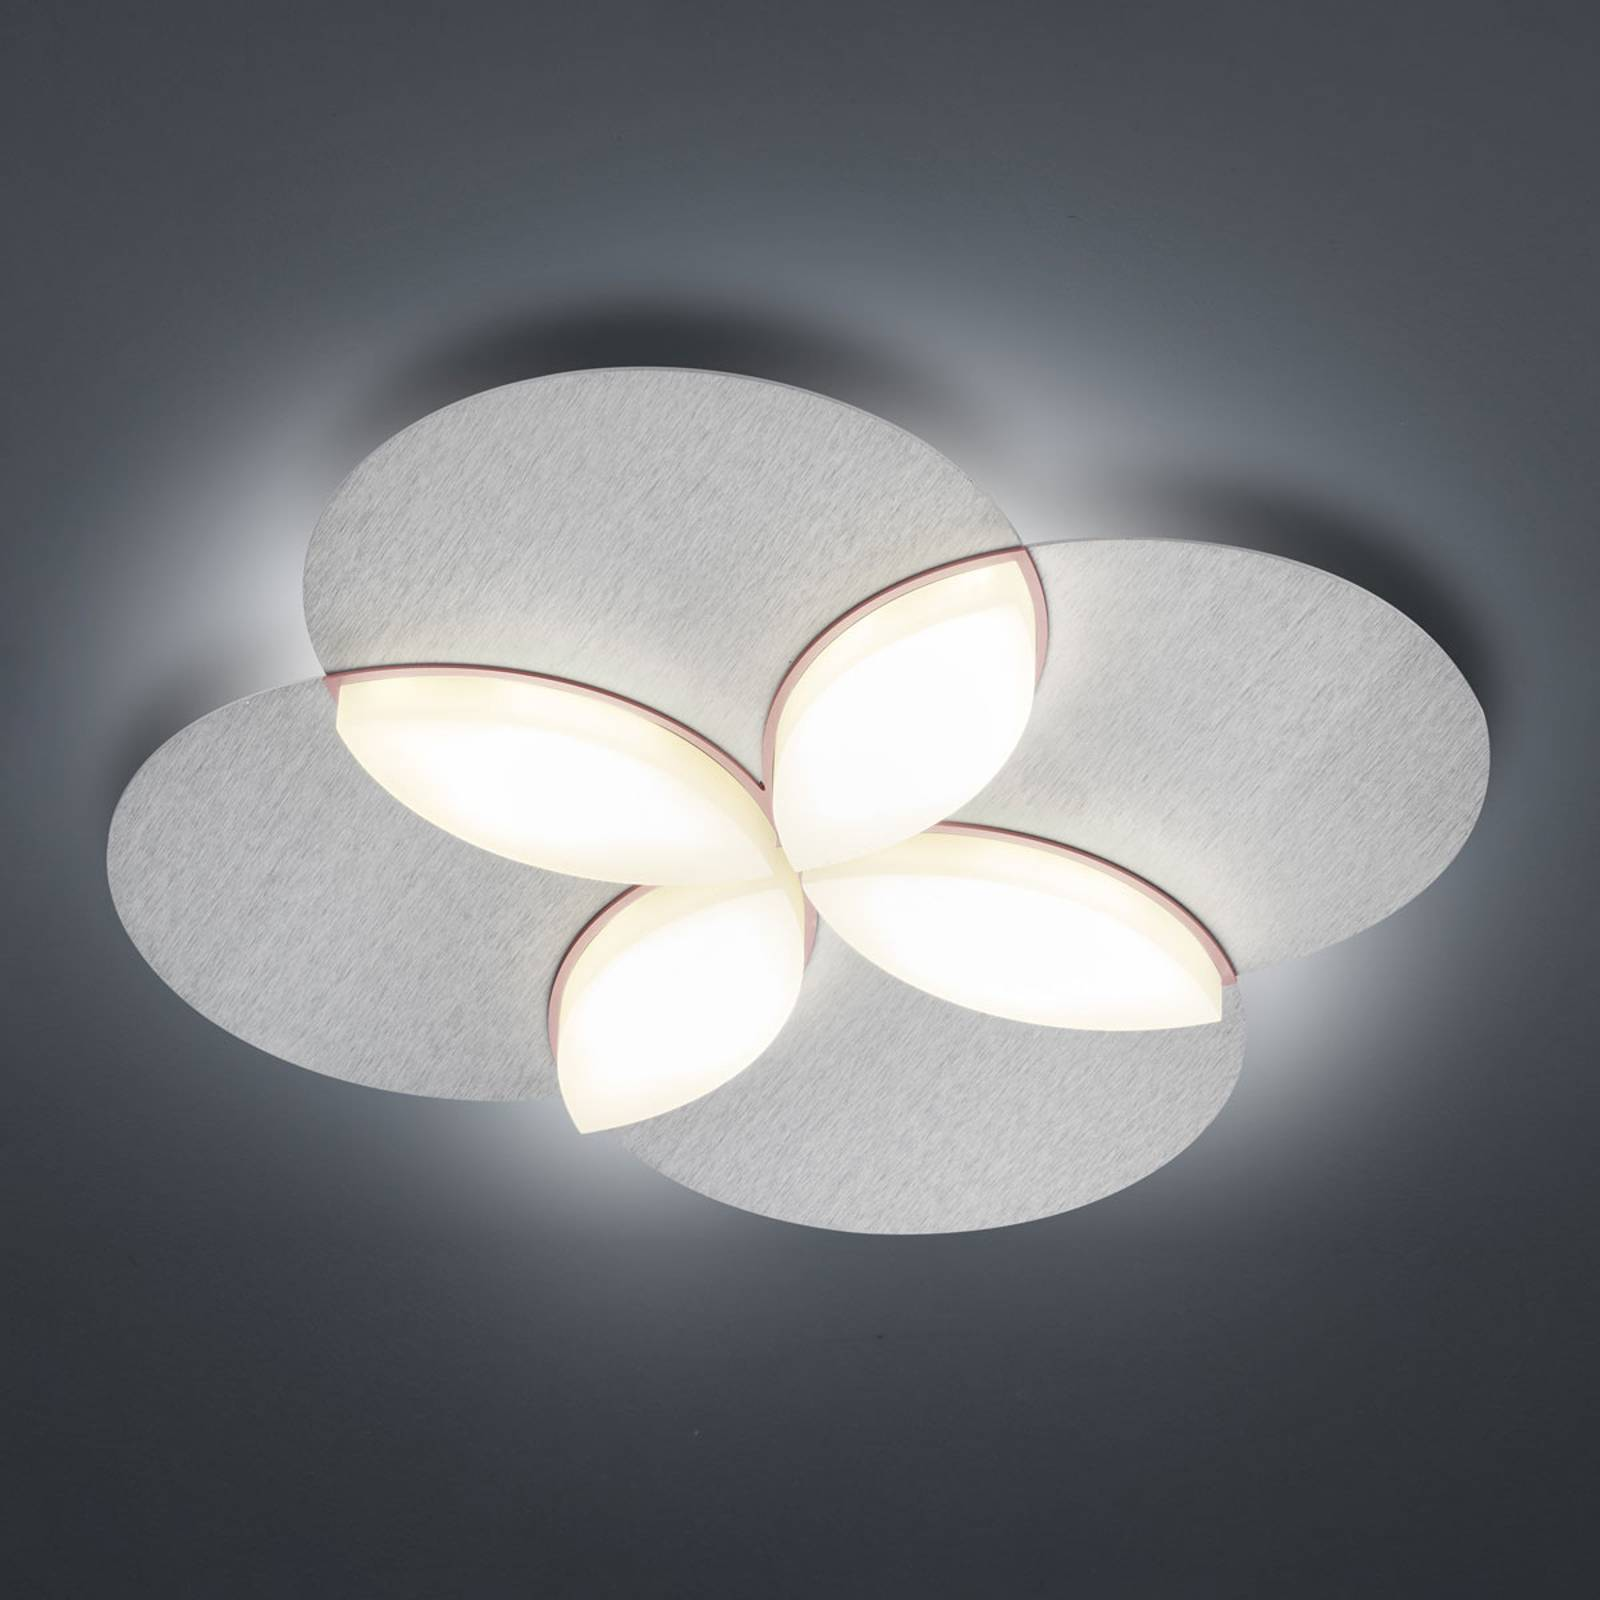 BANKAMP Spring -LED-kattovalaisin, eloksoitu hopea